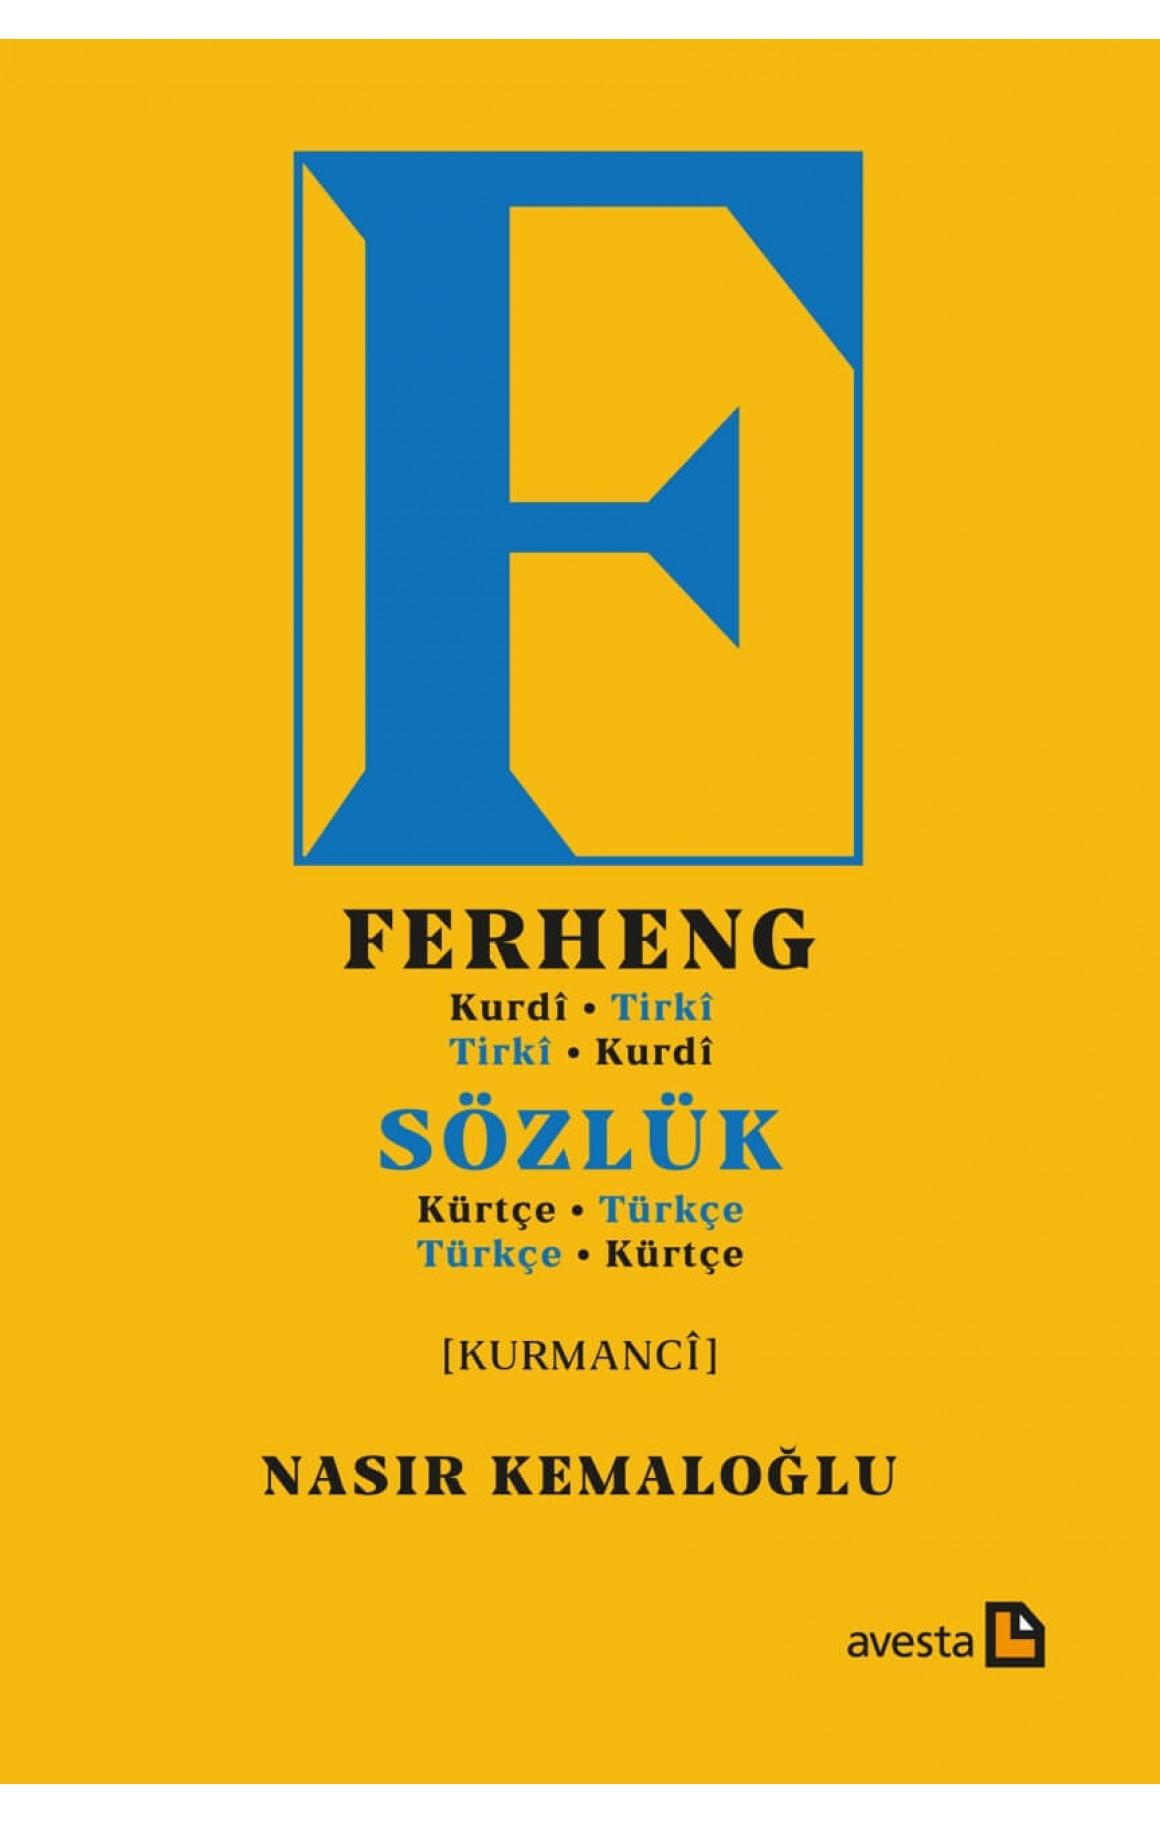 Sözlük (Kürtçe-Türkçe), Ferheng (Kurdî-Tirkî)